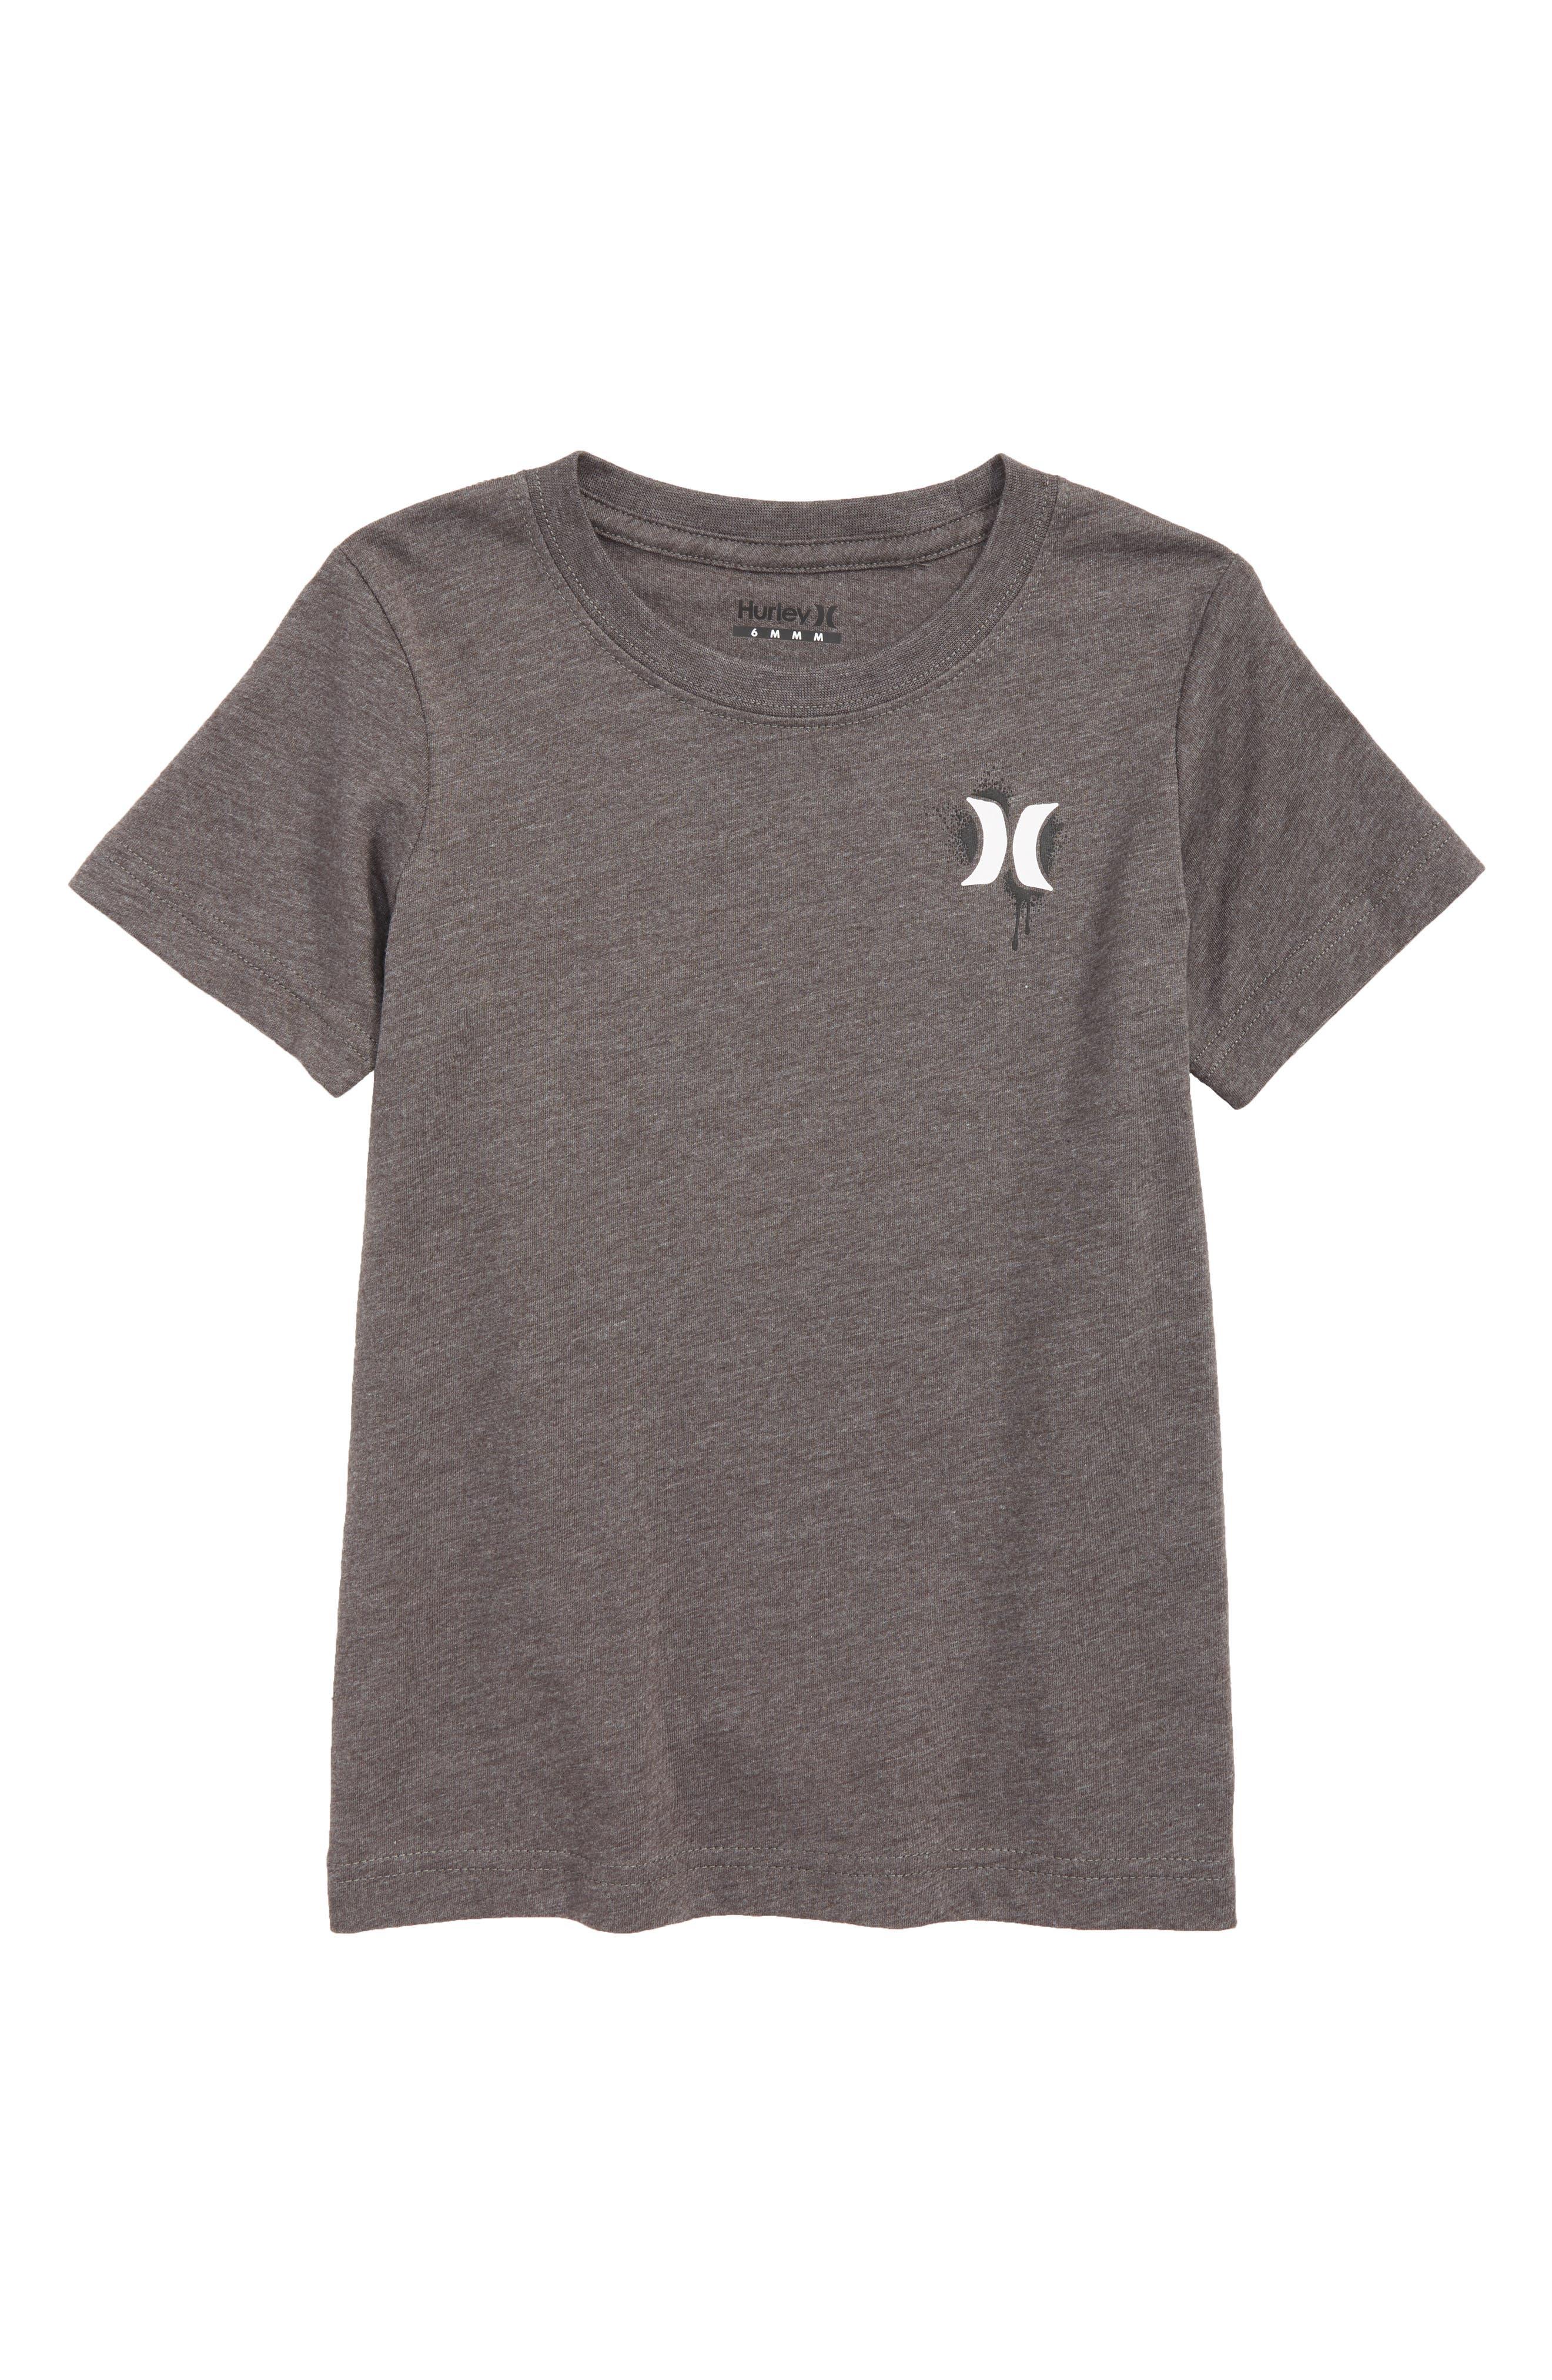 Shark T-Shirt,                         Main,                         color, 020